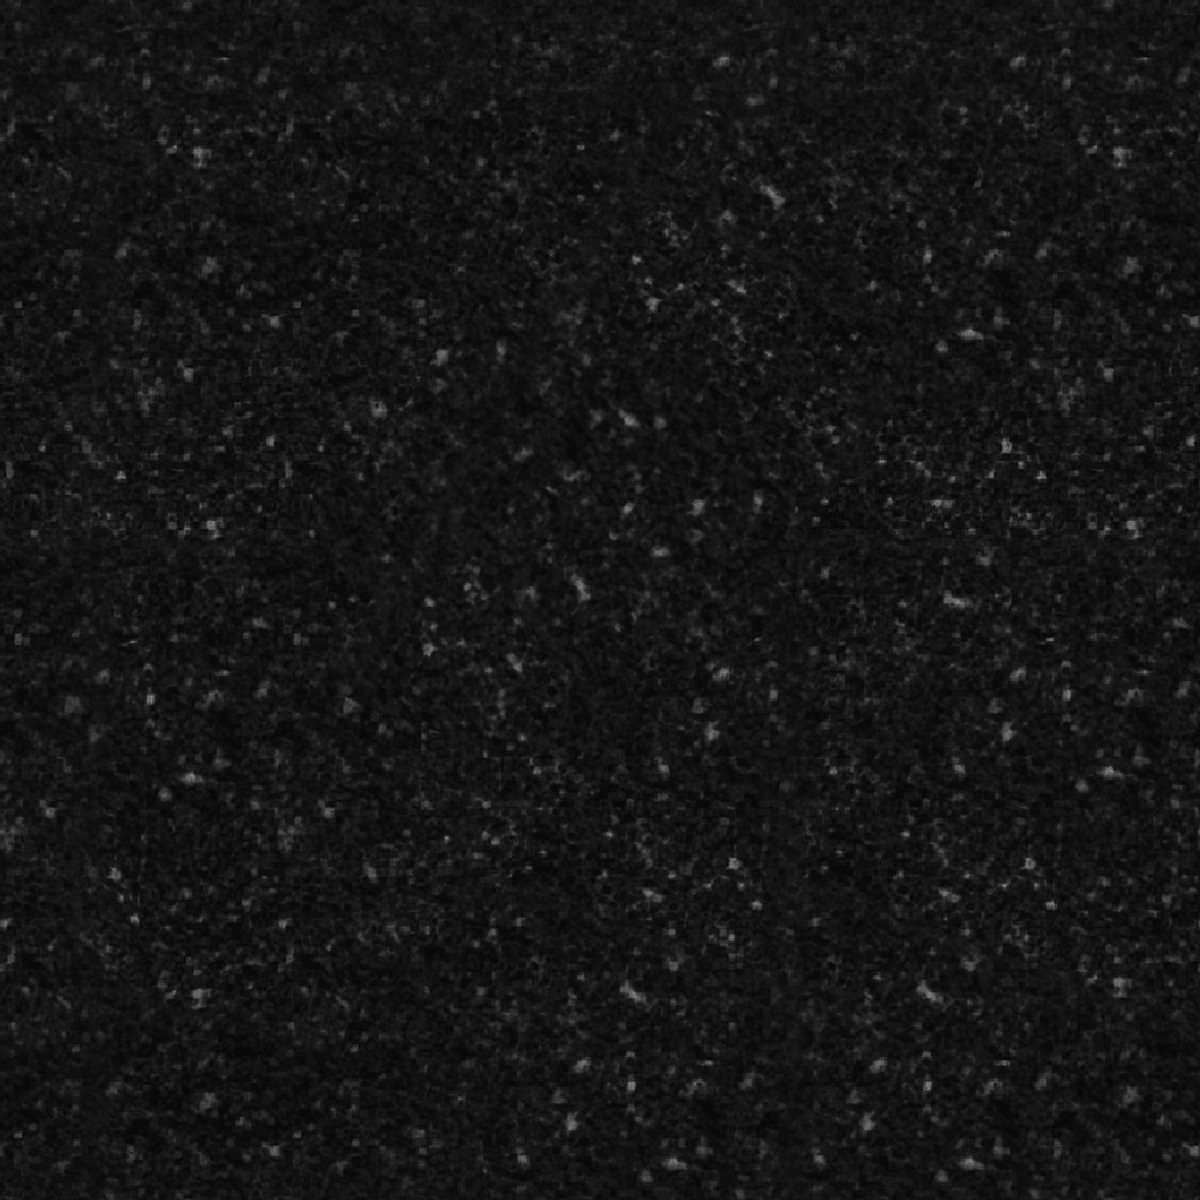 Black Galaxy Granite Texture Seamless | www.imgkid.com ...